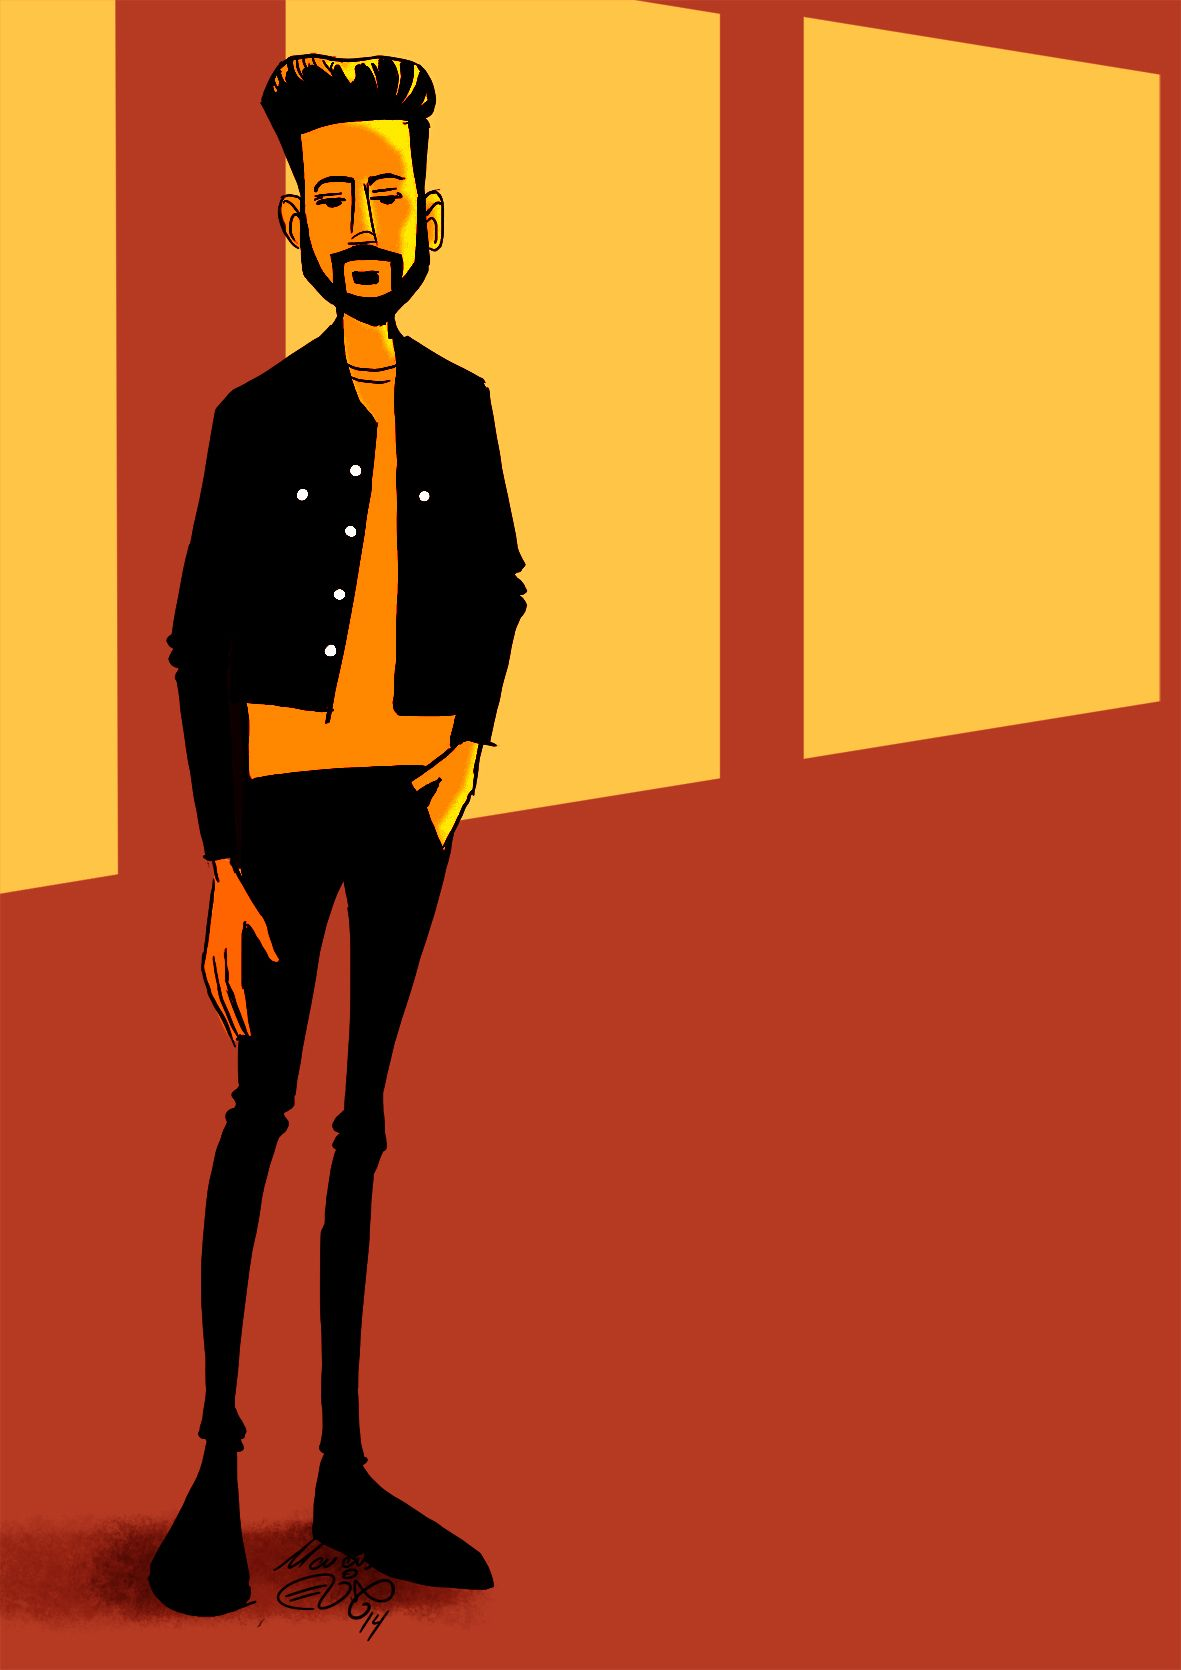 Pin de William Andrés Suárez Ortiz en Drawing | Pinterest | Marcos y ...